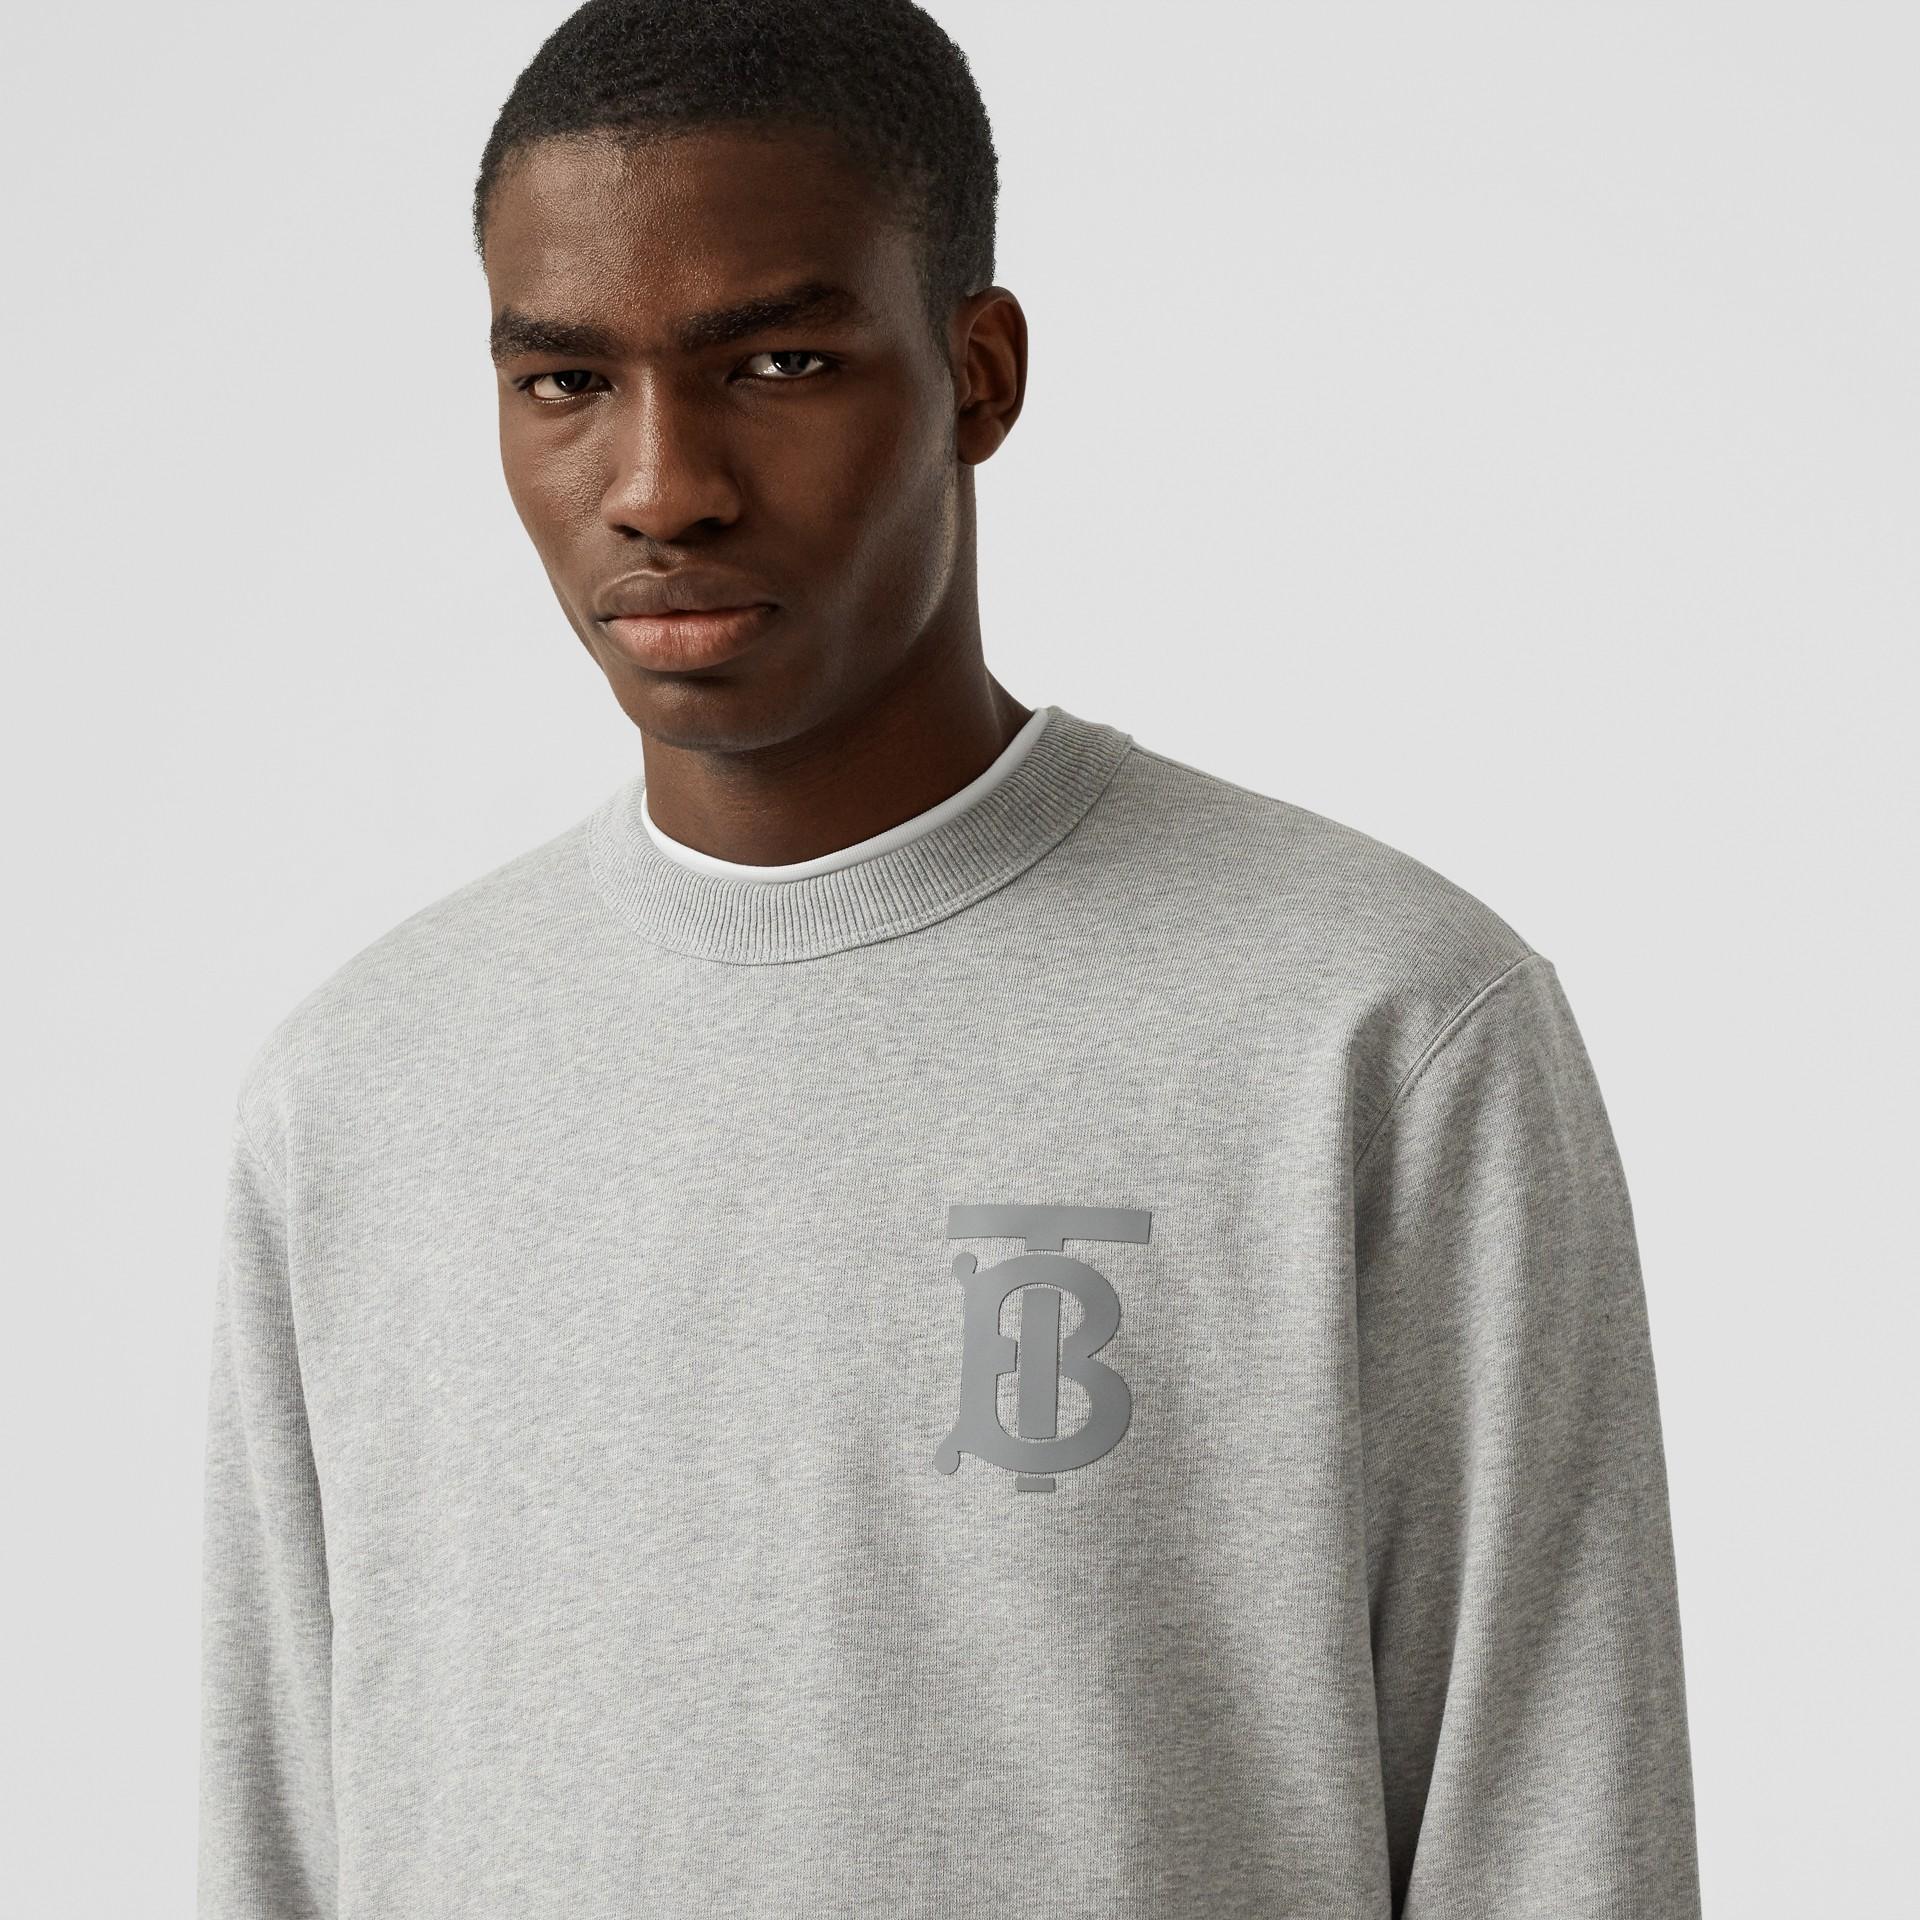 Monogram Motif Cotton Sweatshirt in Pale Grey Melange - Men | Burberry United Kingdom - gallery image 1